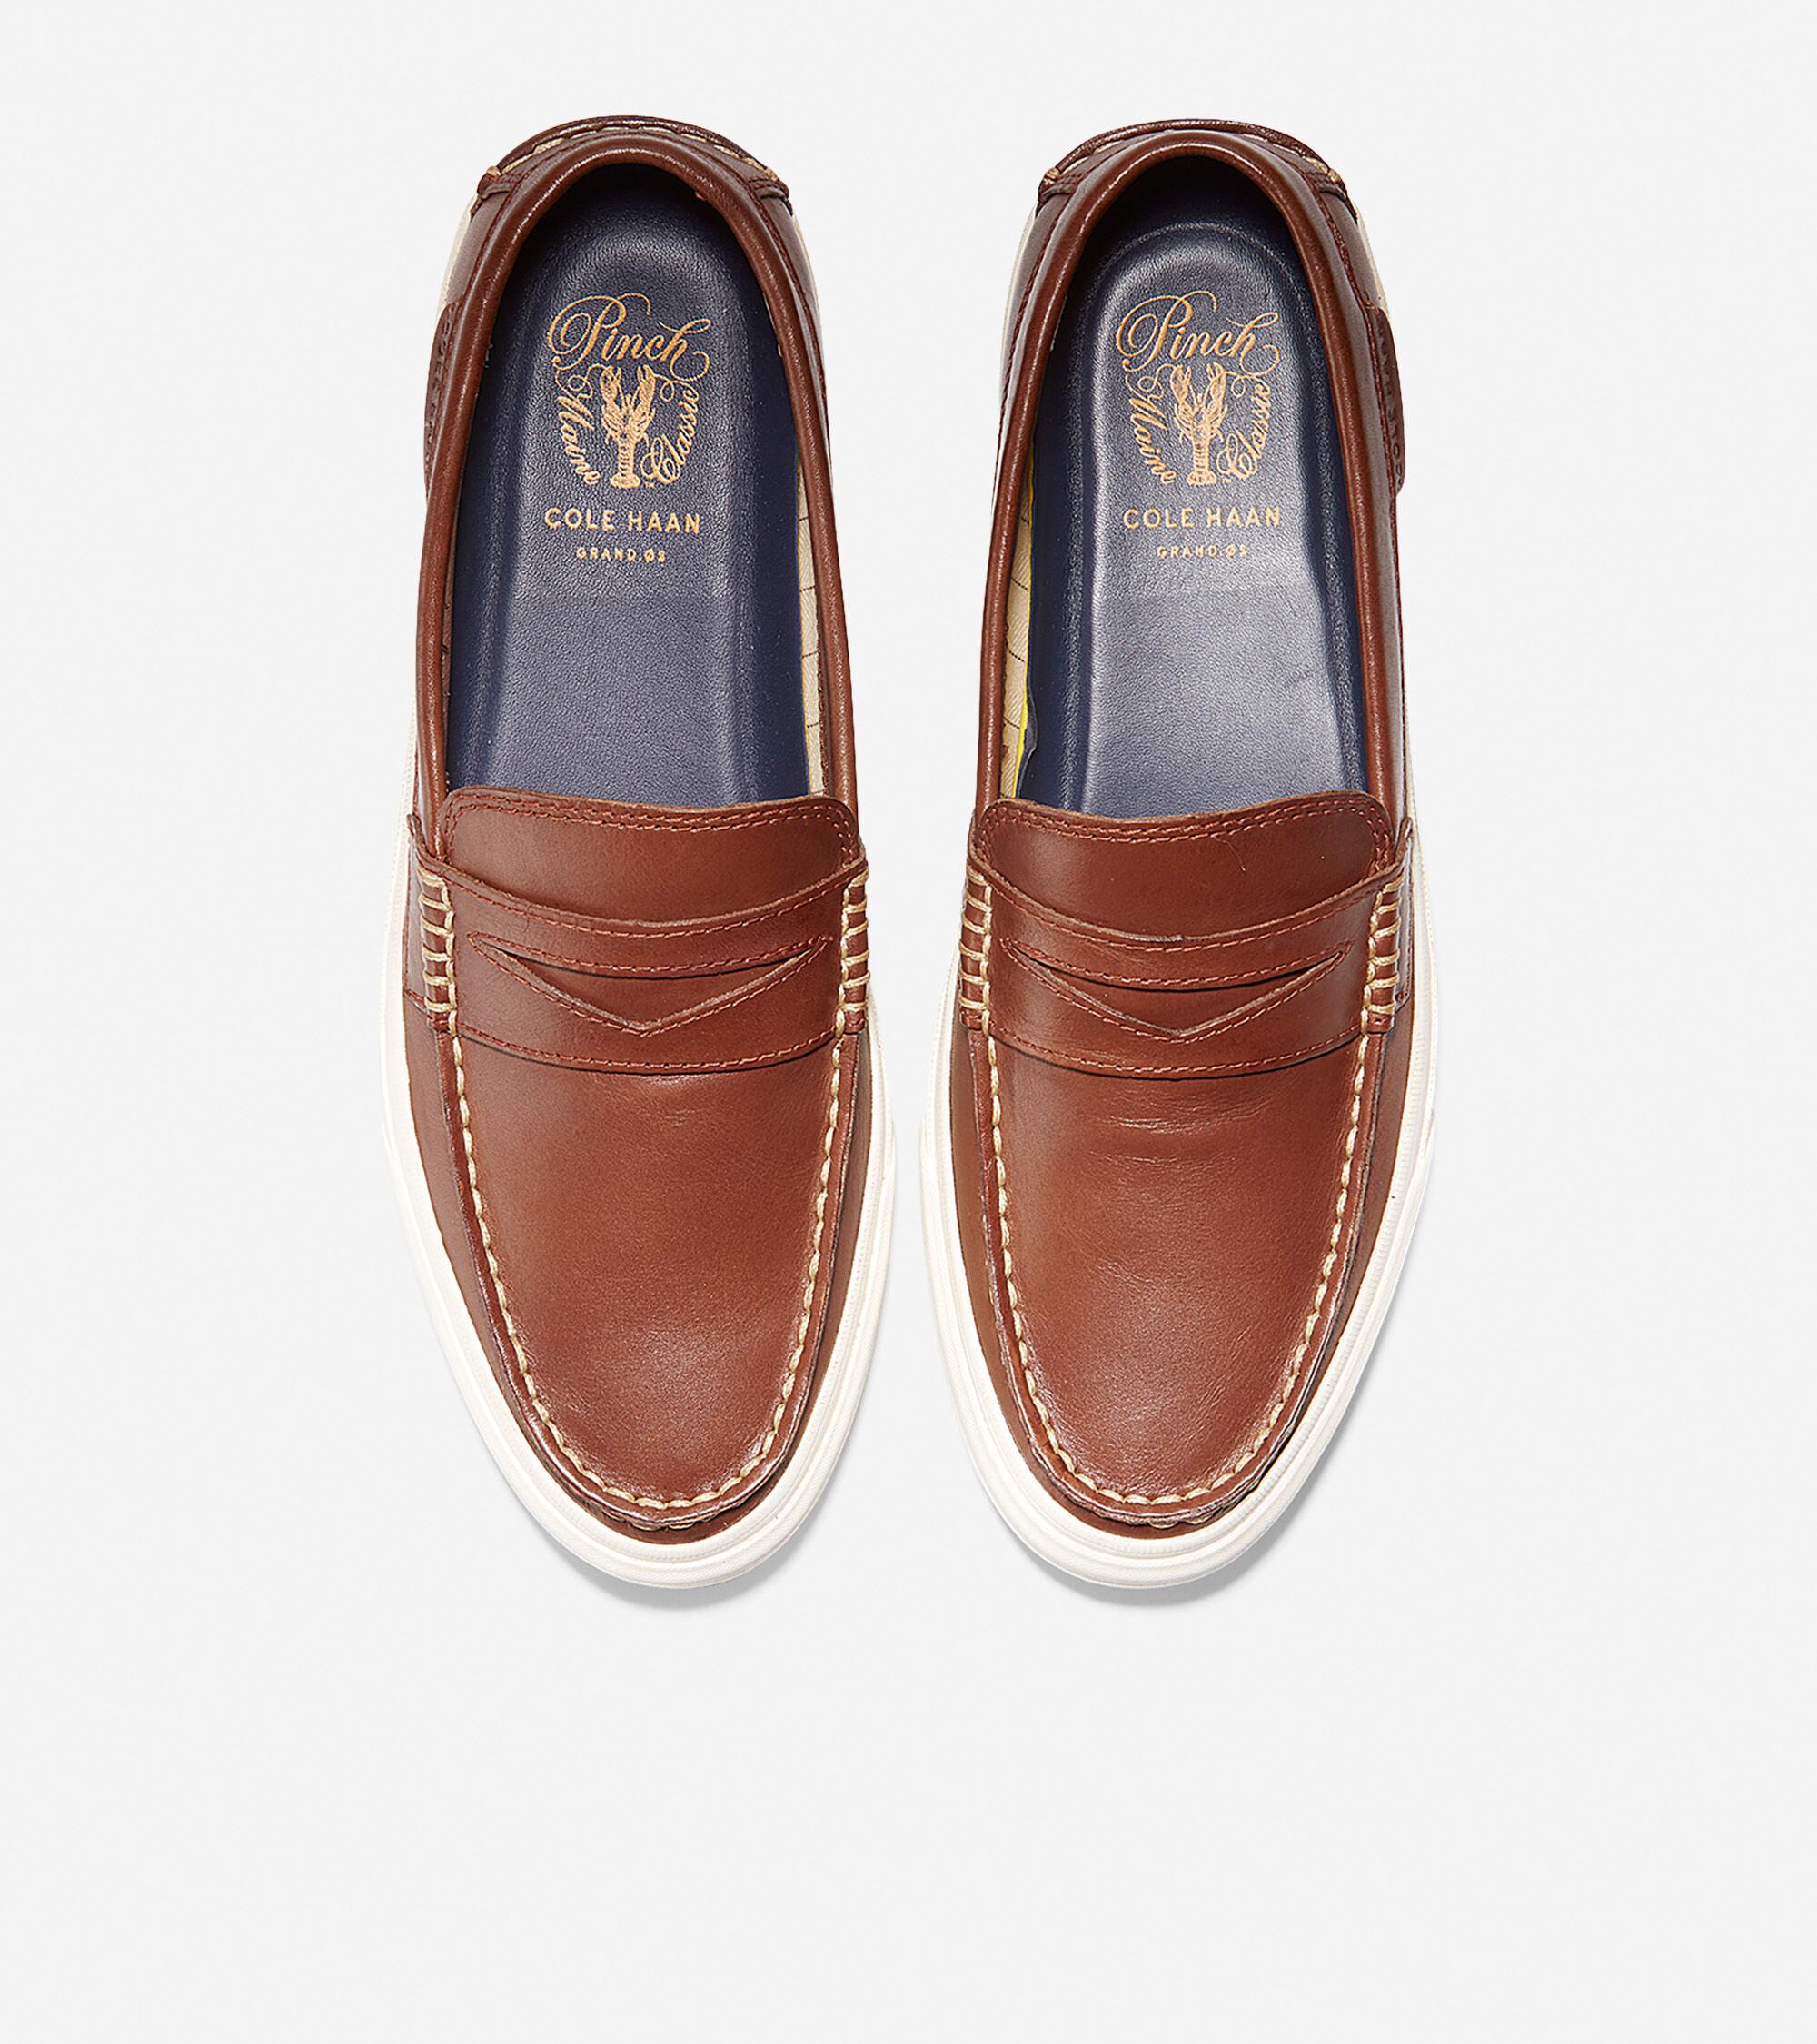 Men's Pinch Weekender LX Loafer fashionable cheap online BjsAA9ADs3